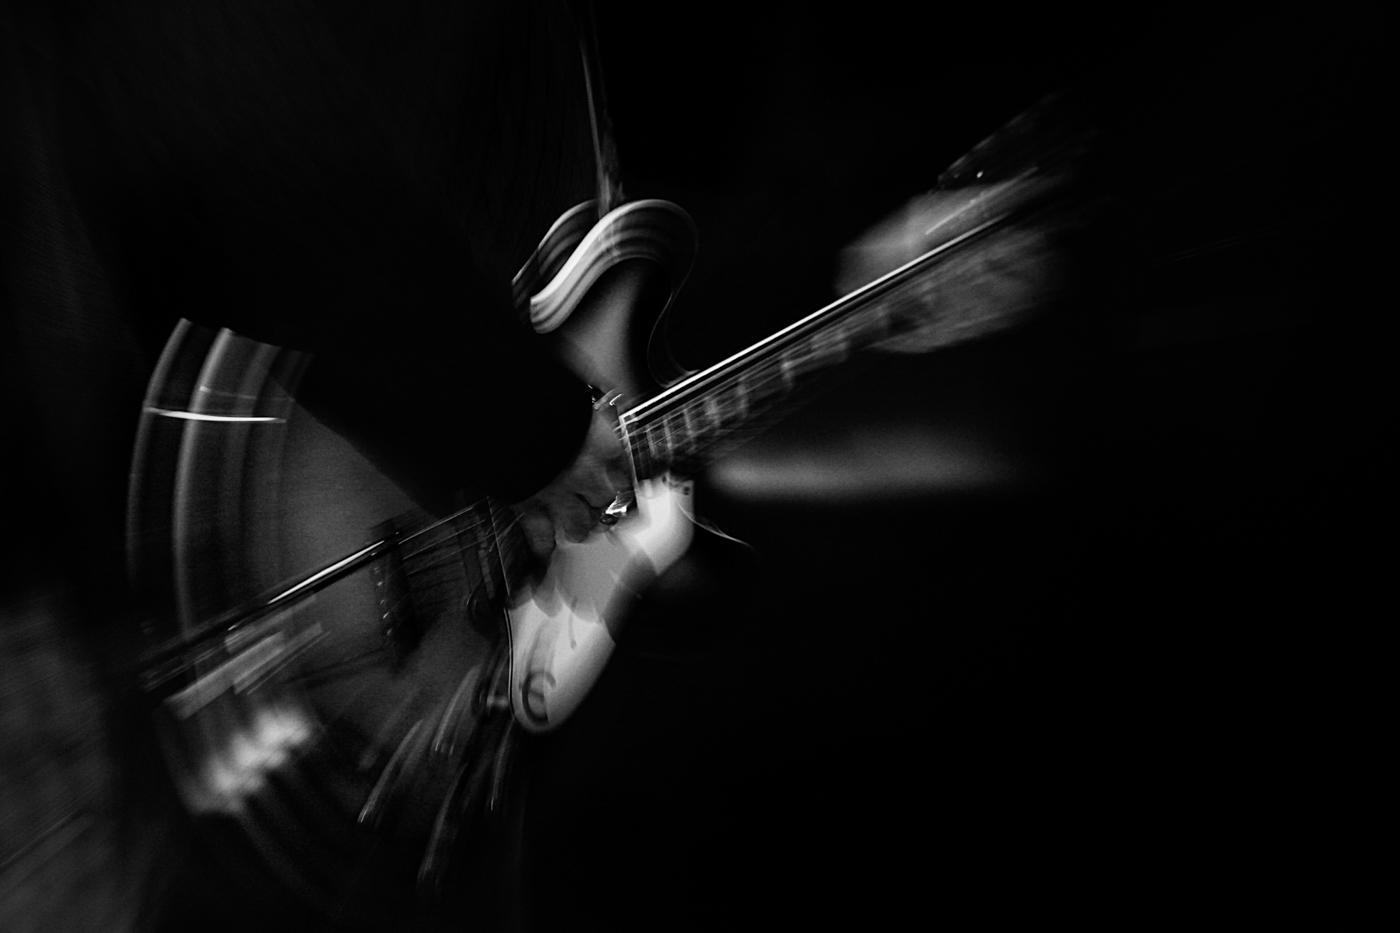 Music - Julián Rus - Music